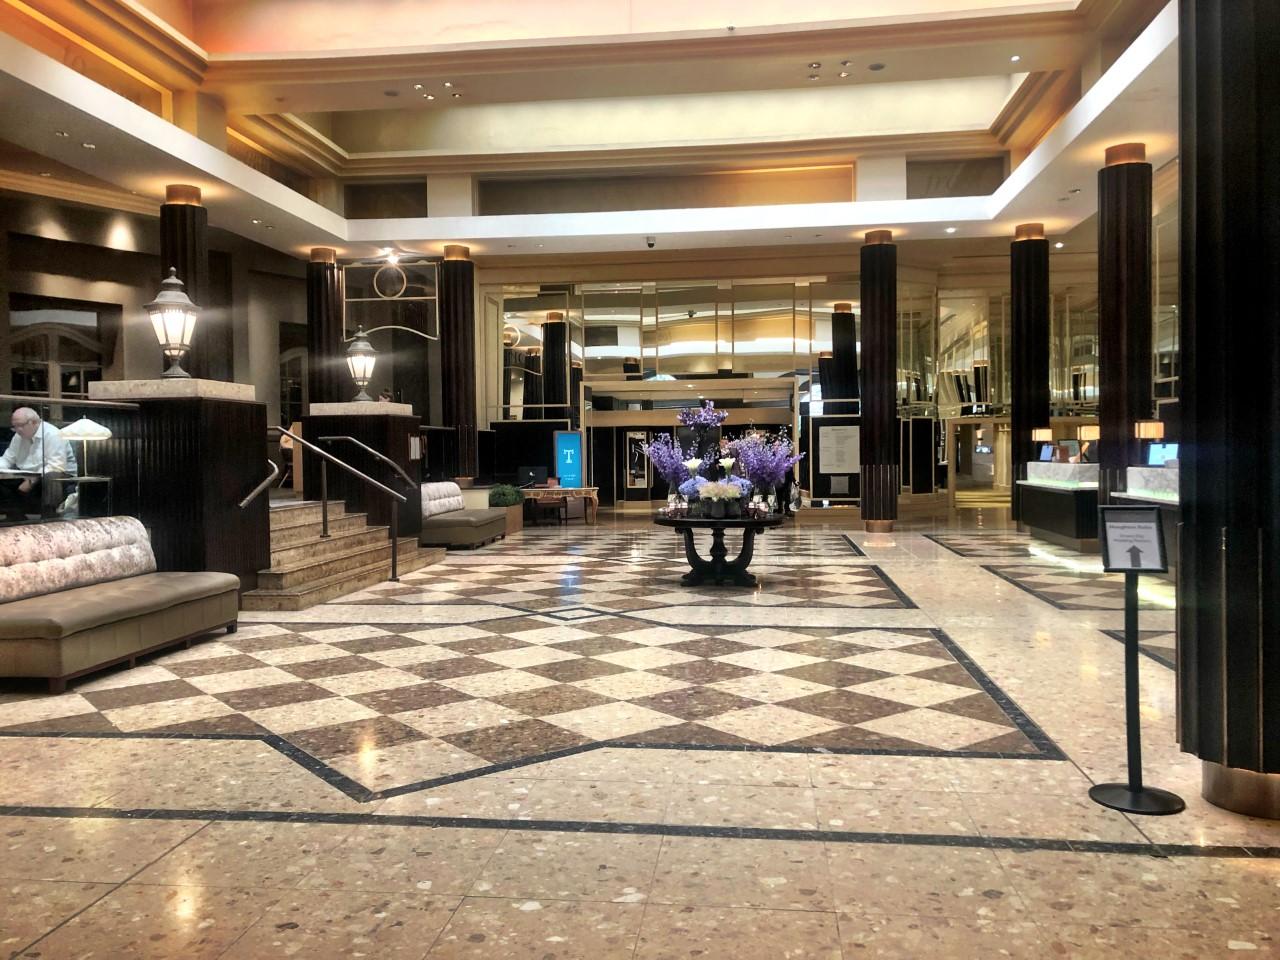 The Midland Hotel Manchester: Lobby